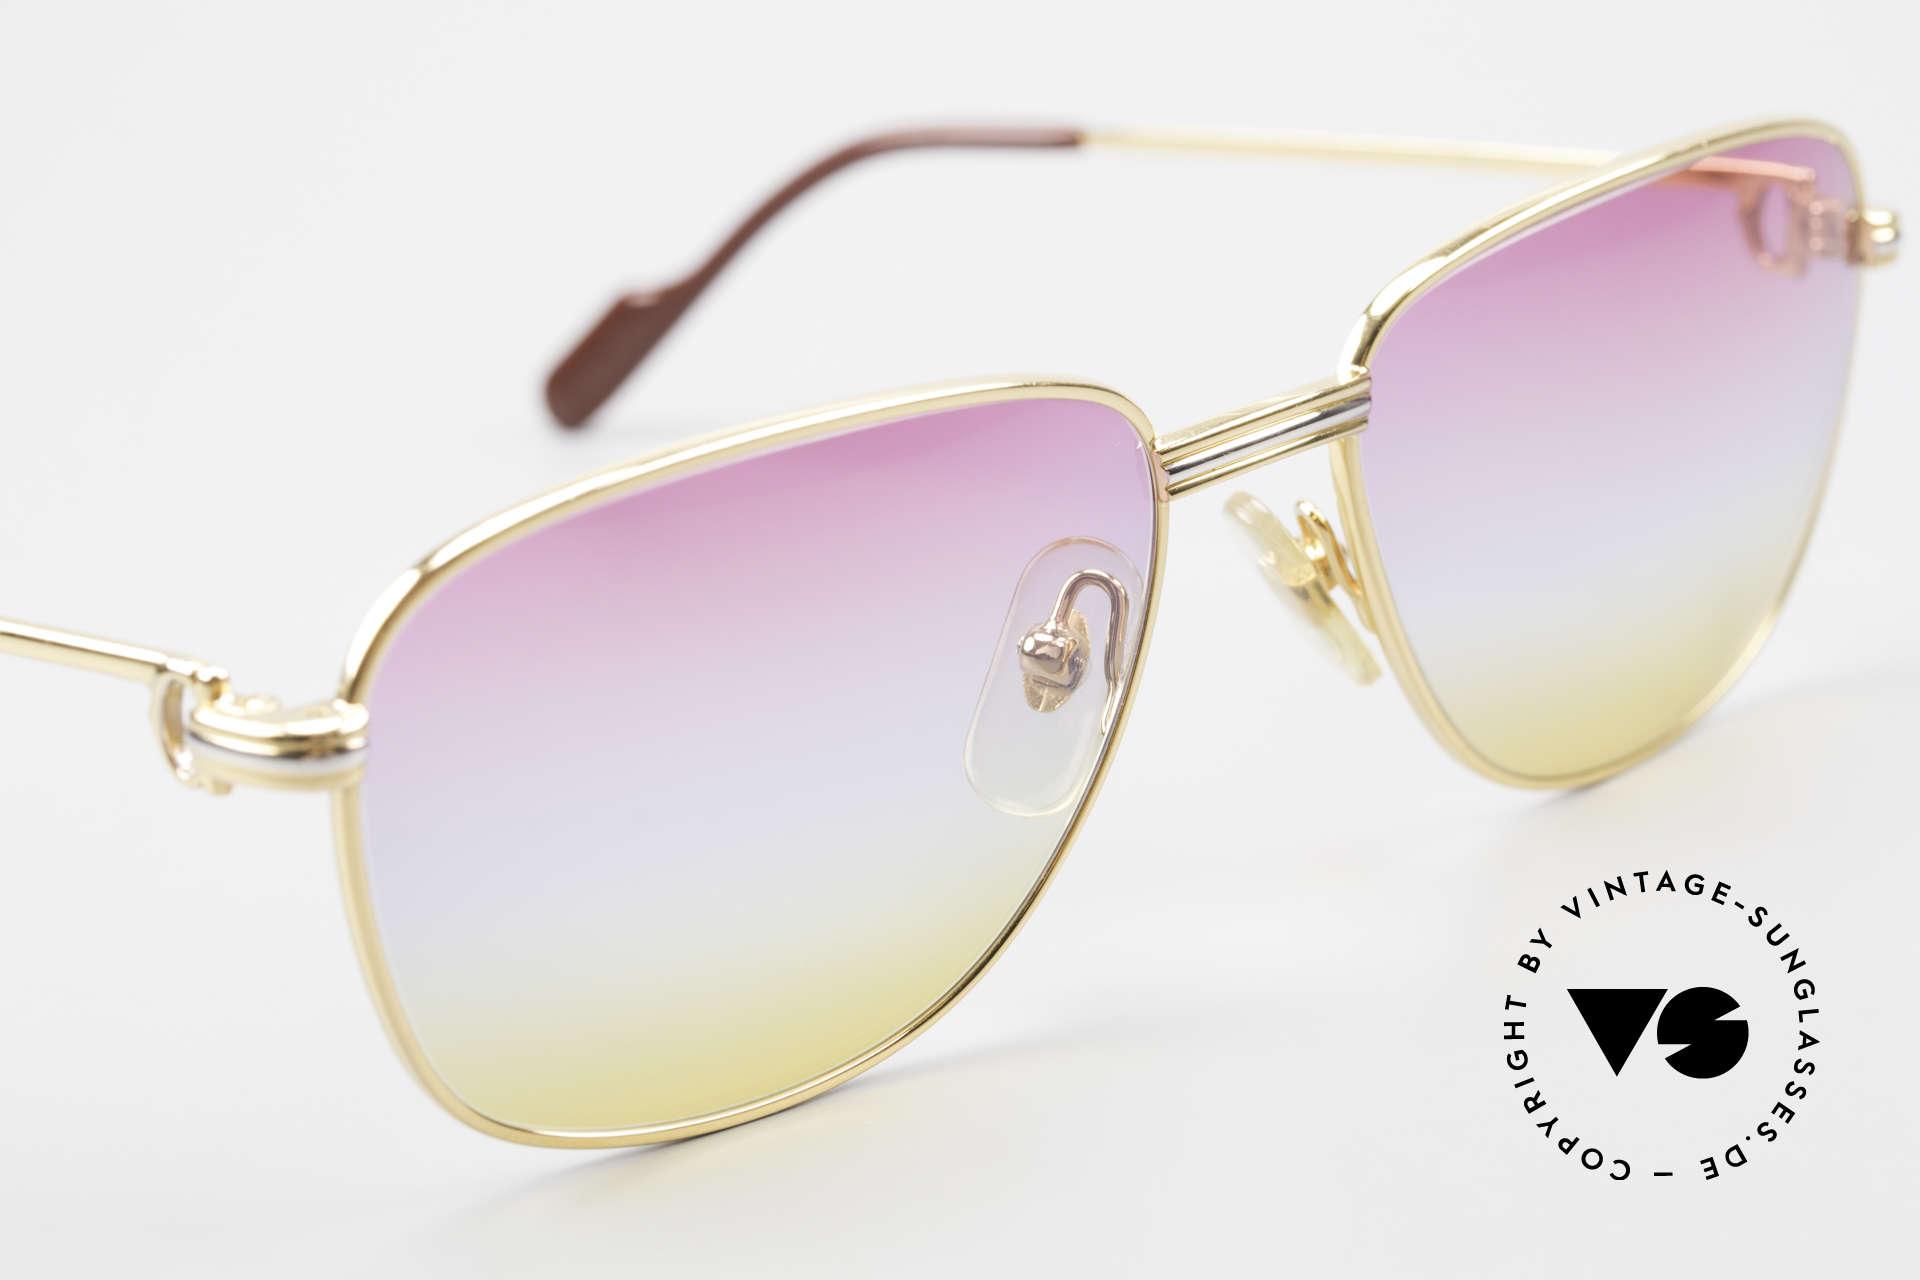 Cartier Courcelles Unique 90's Luxury Sunglasses, NO retro eyewear, but a genuine old Cartier Original!, Made for Men and Women